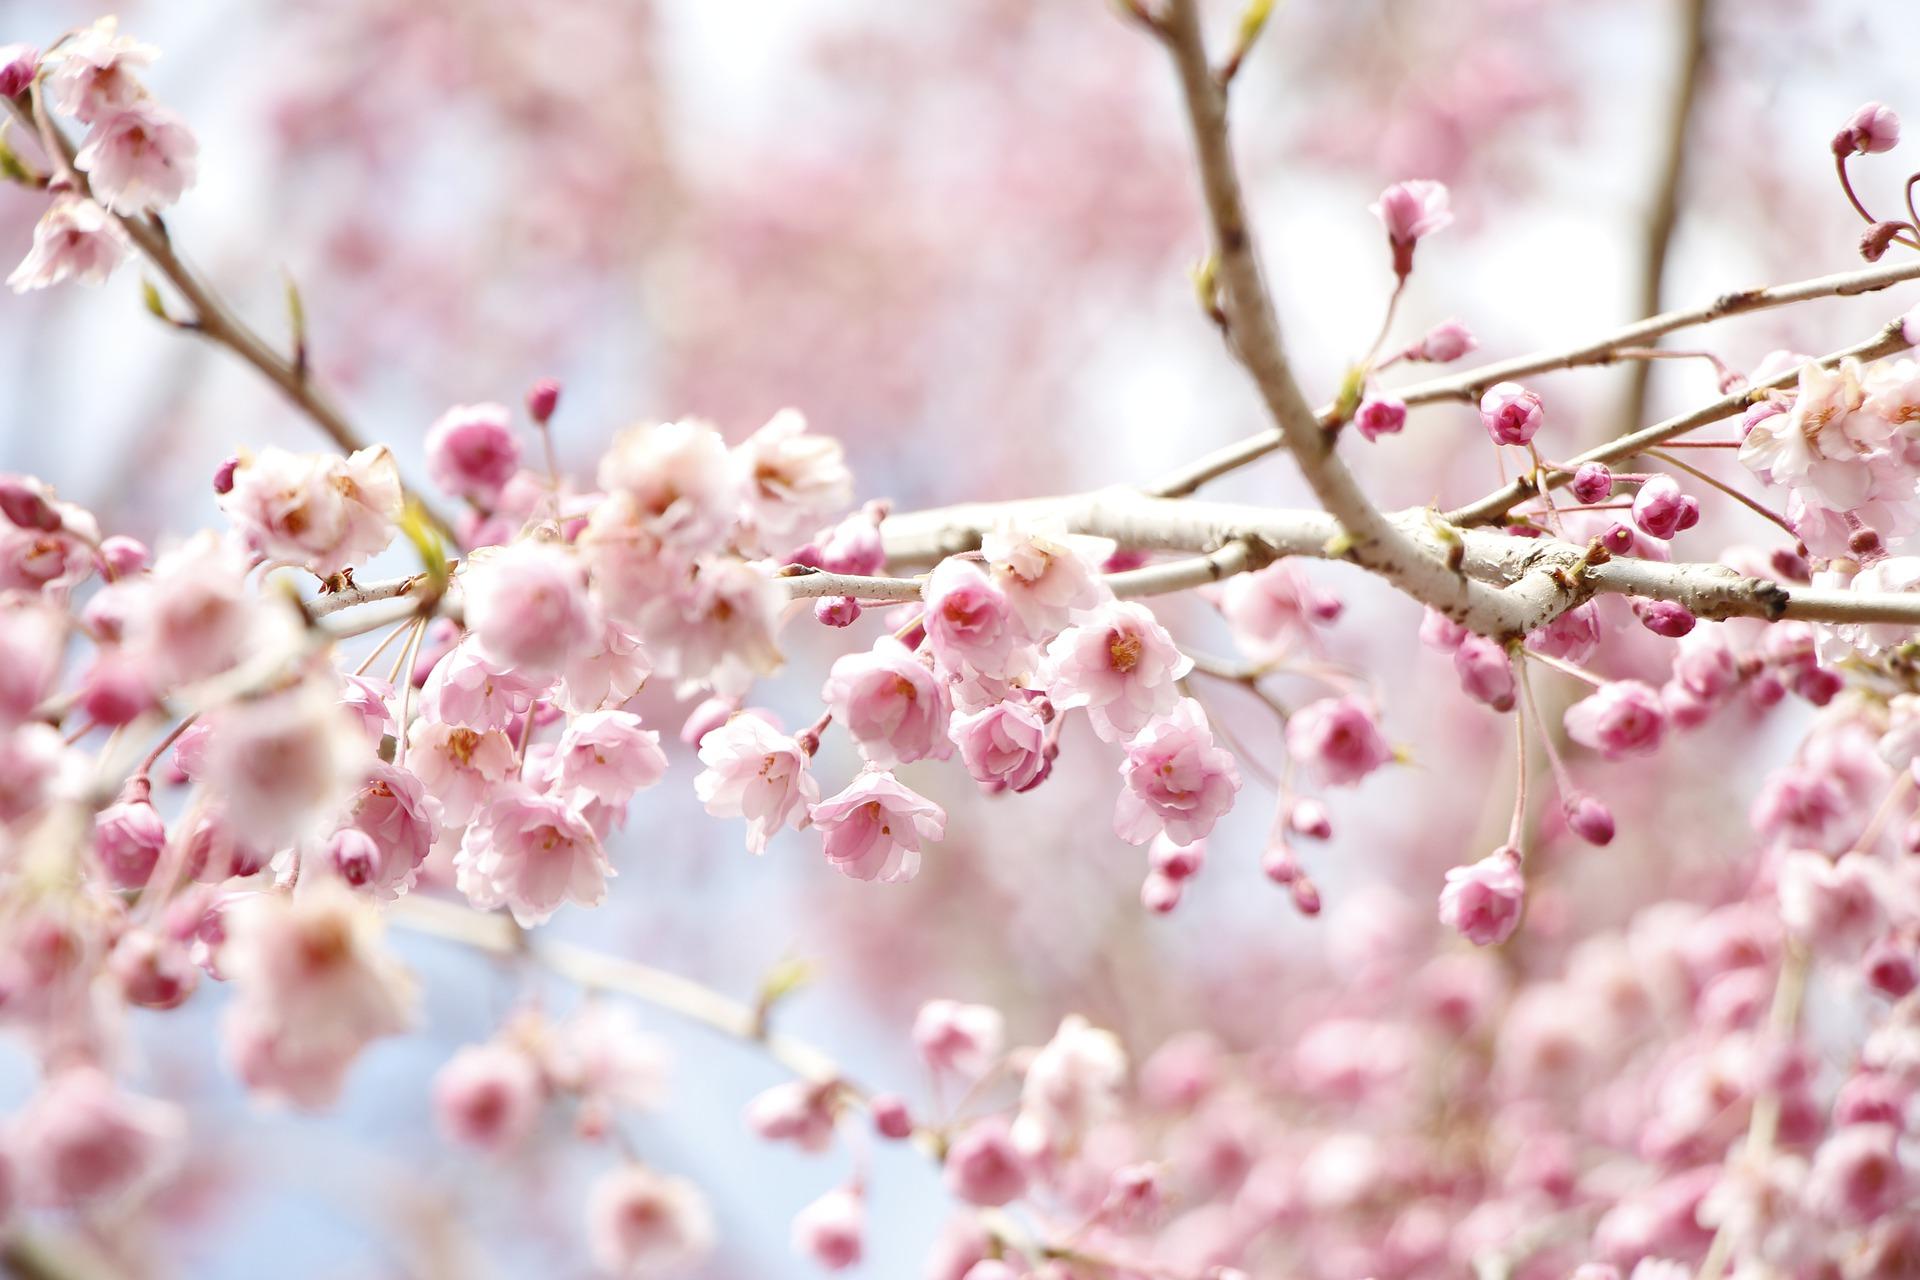 weeping-cherry-tree-flowers